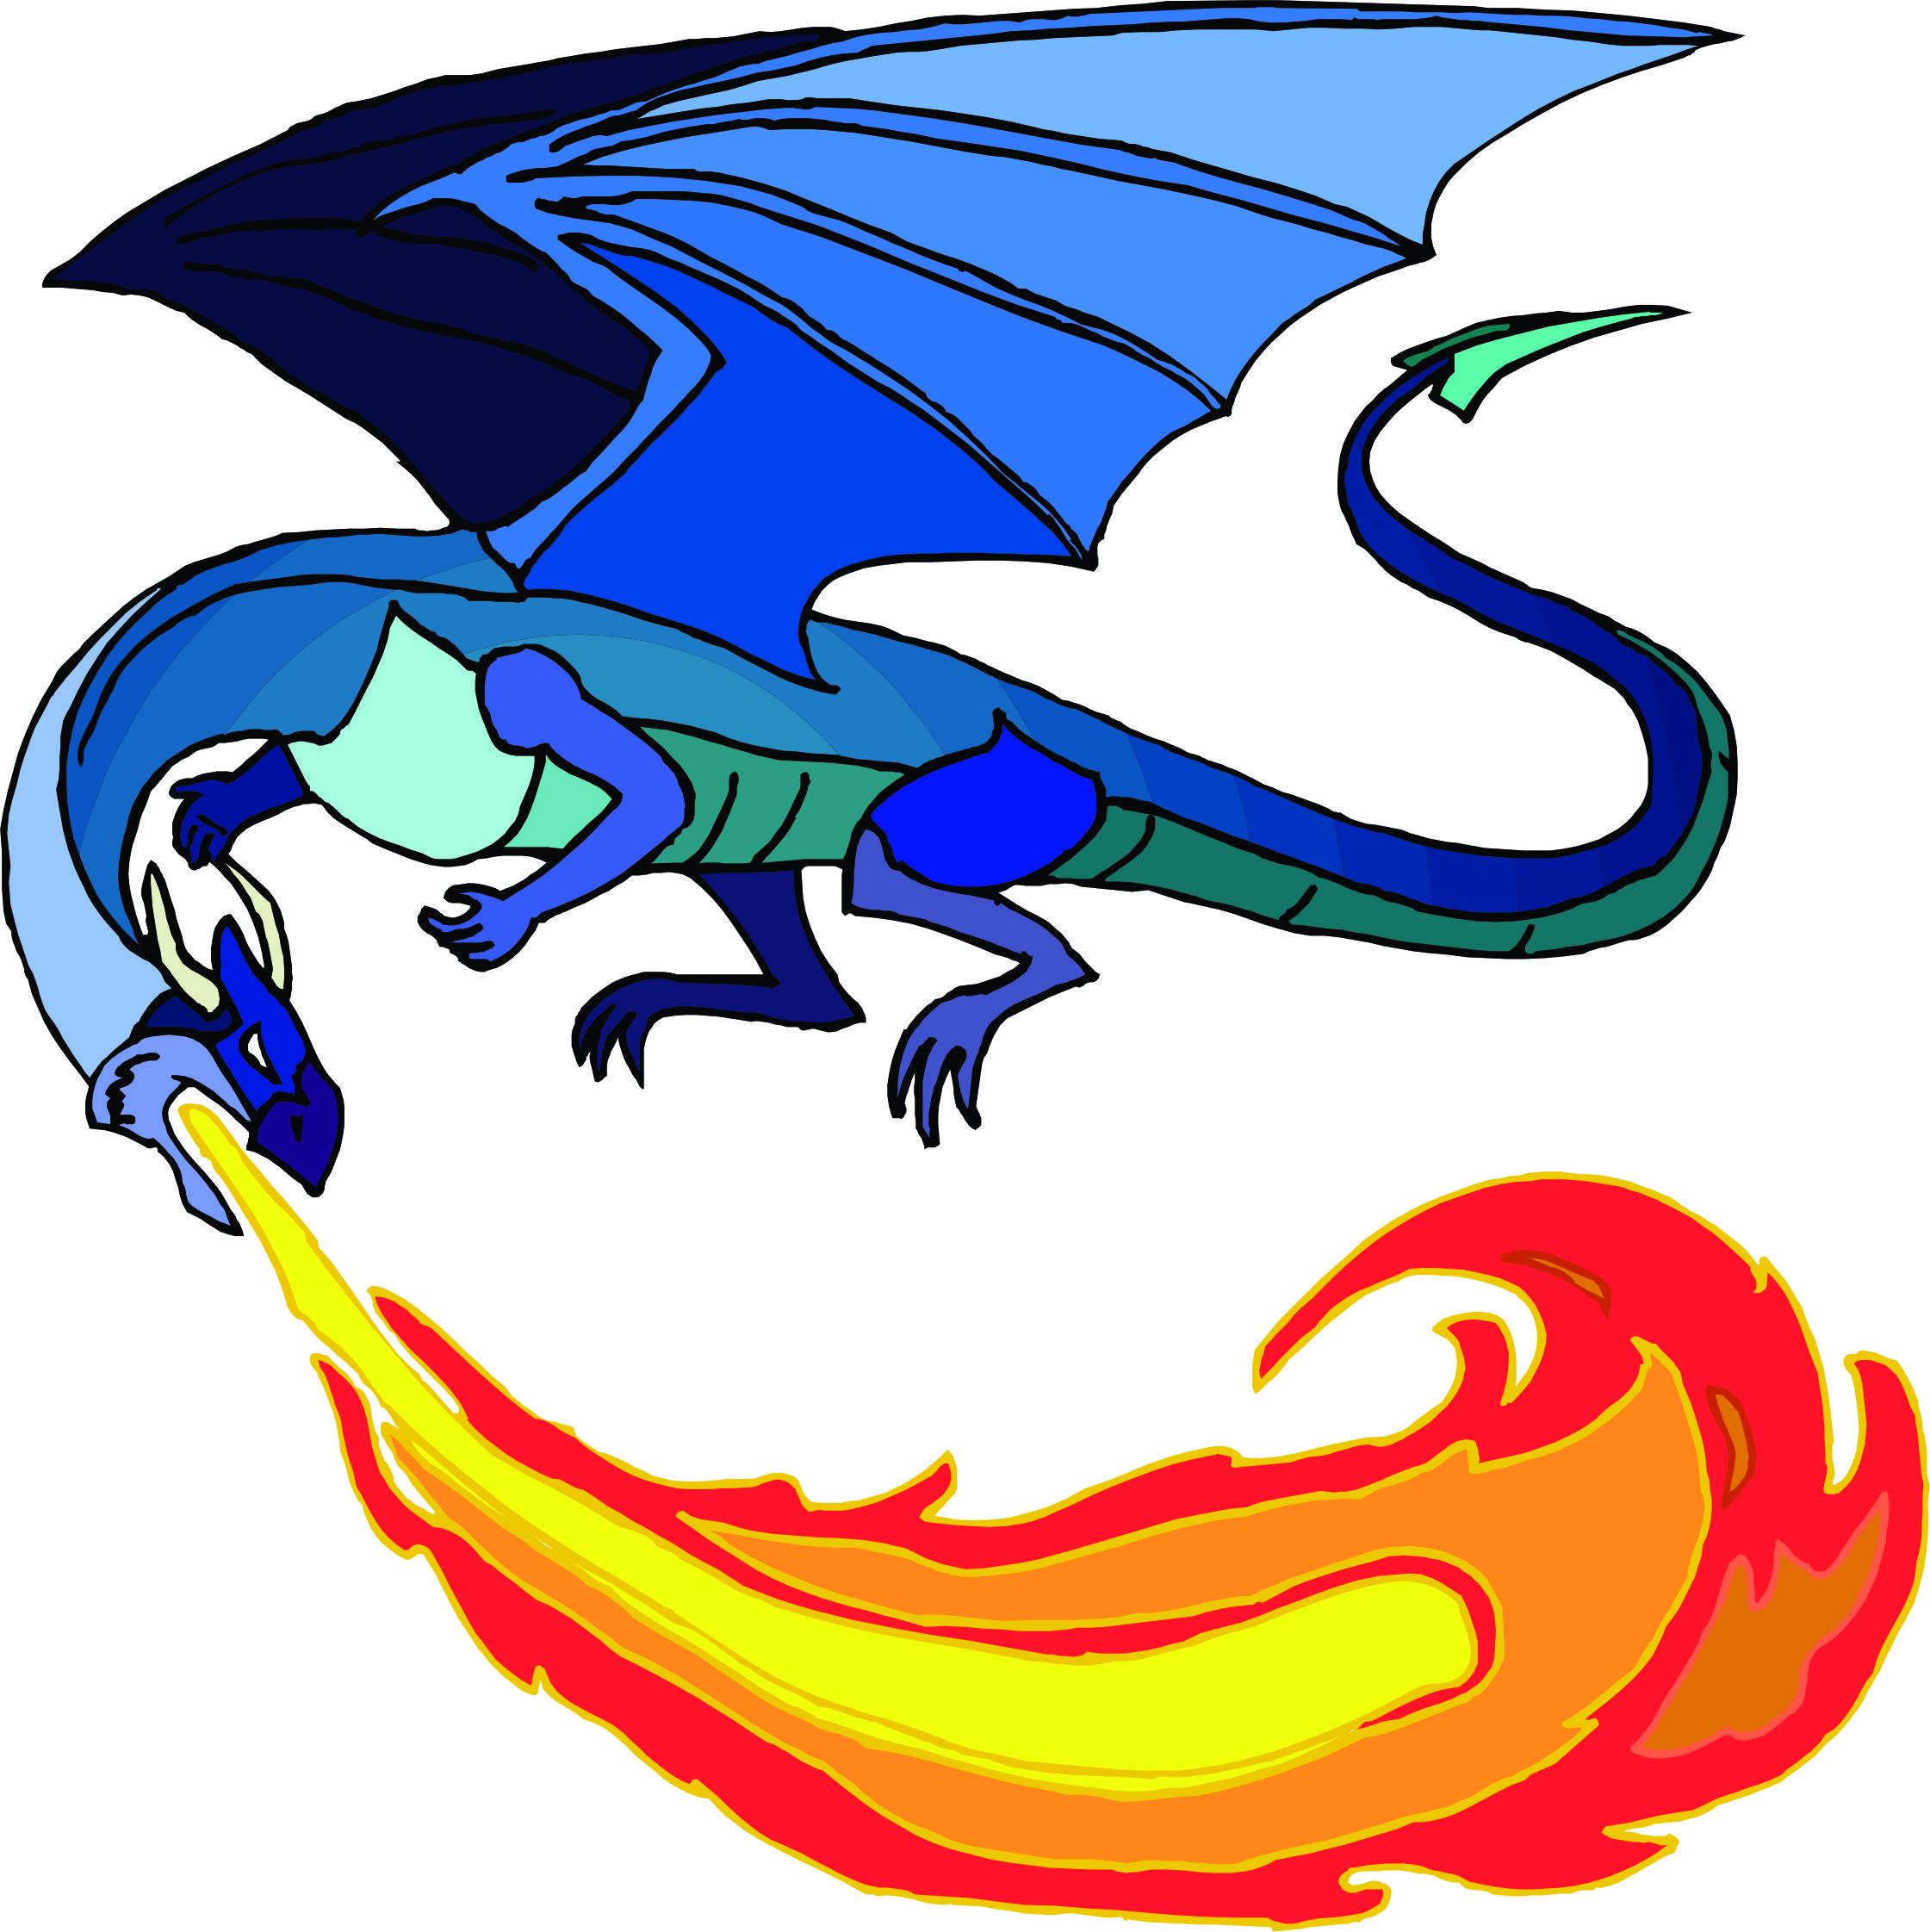 Fire dragon clipart.